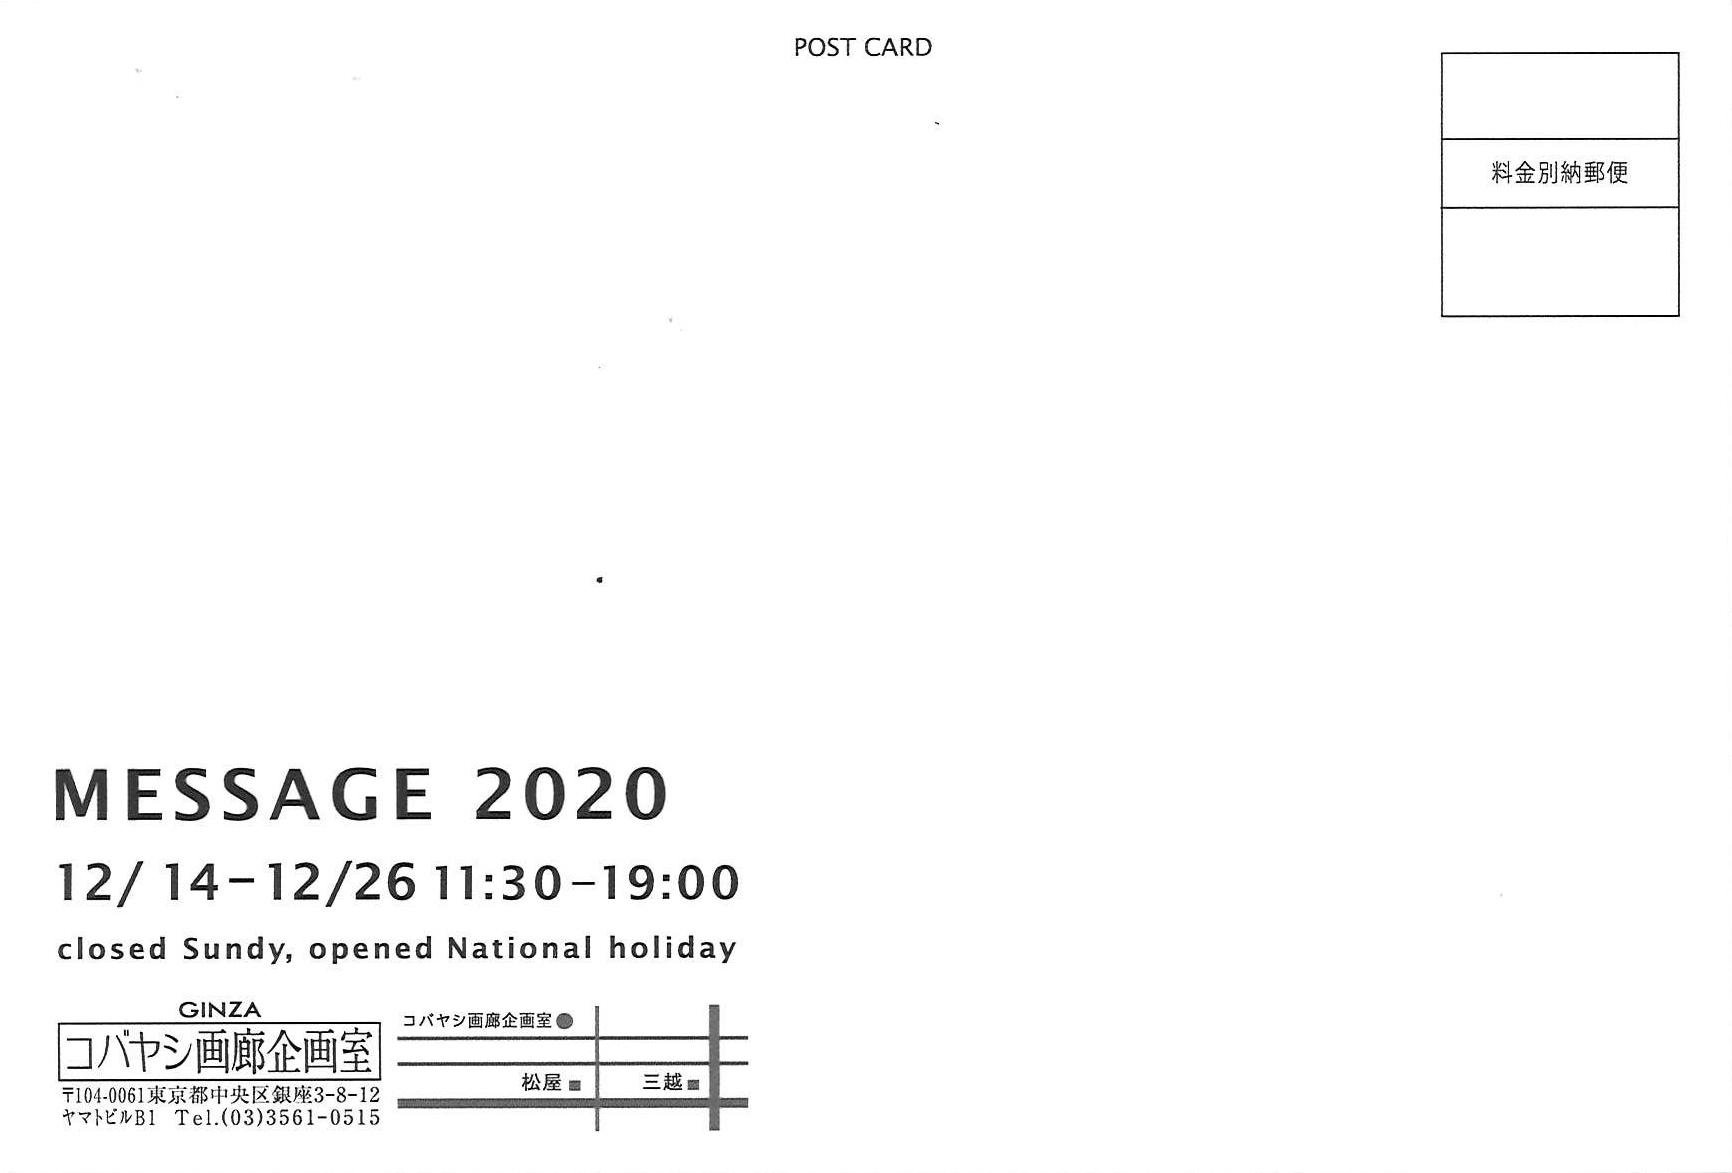 20201210170217_00001